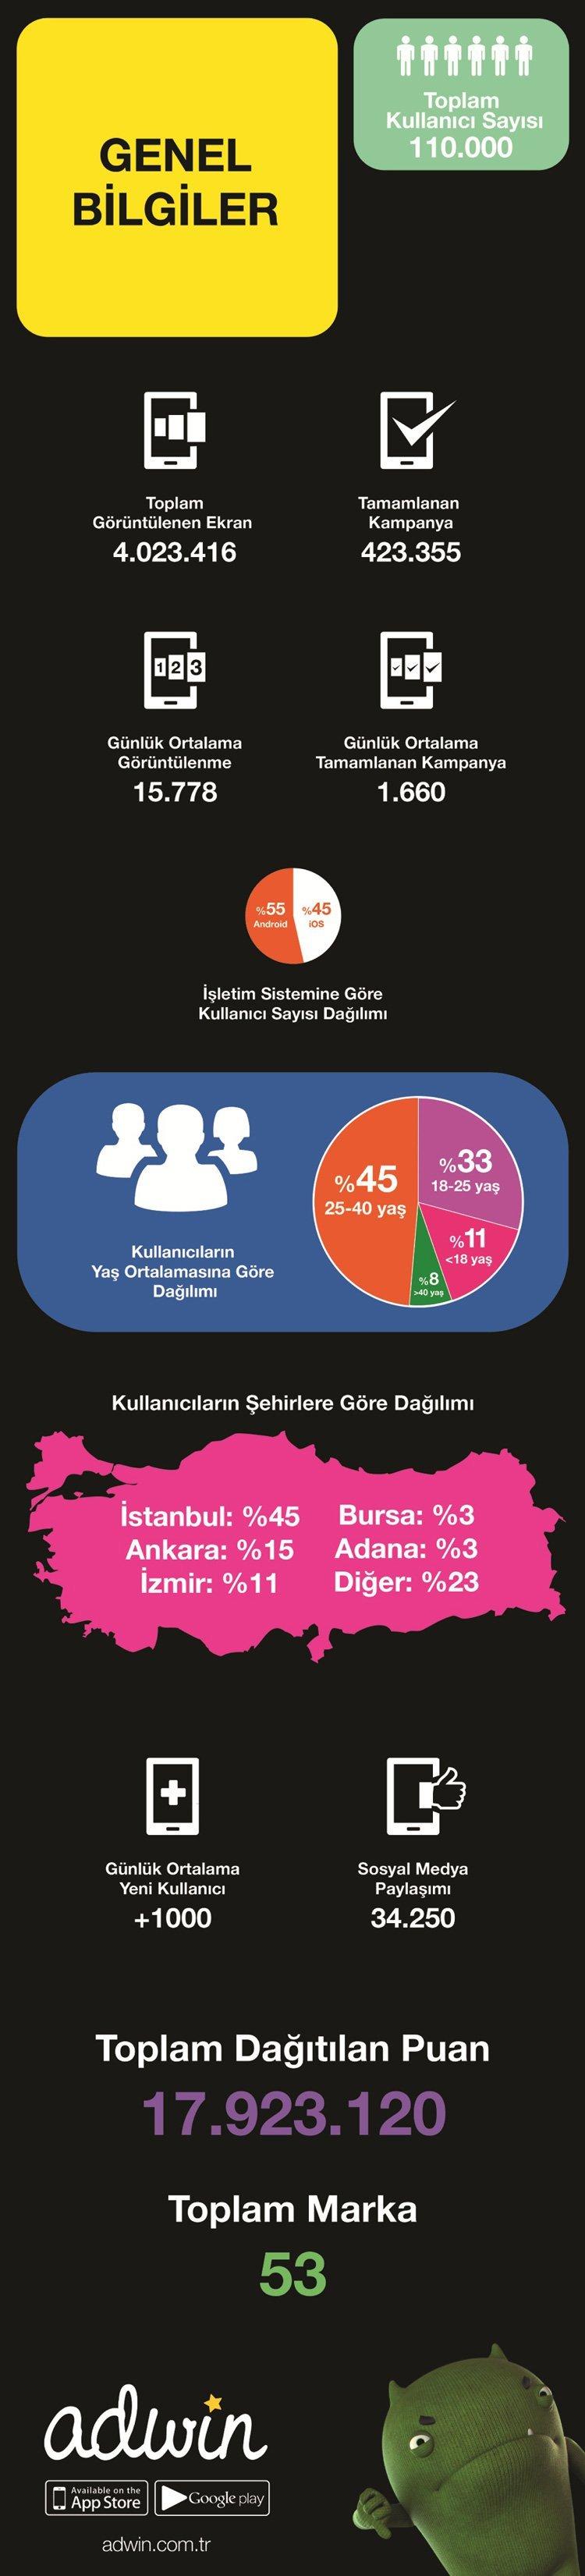 adwin-infografik-100